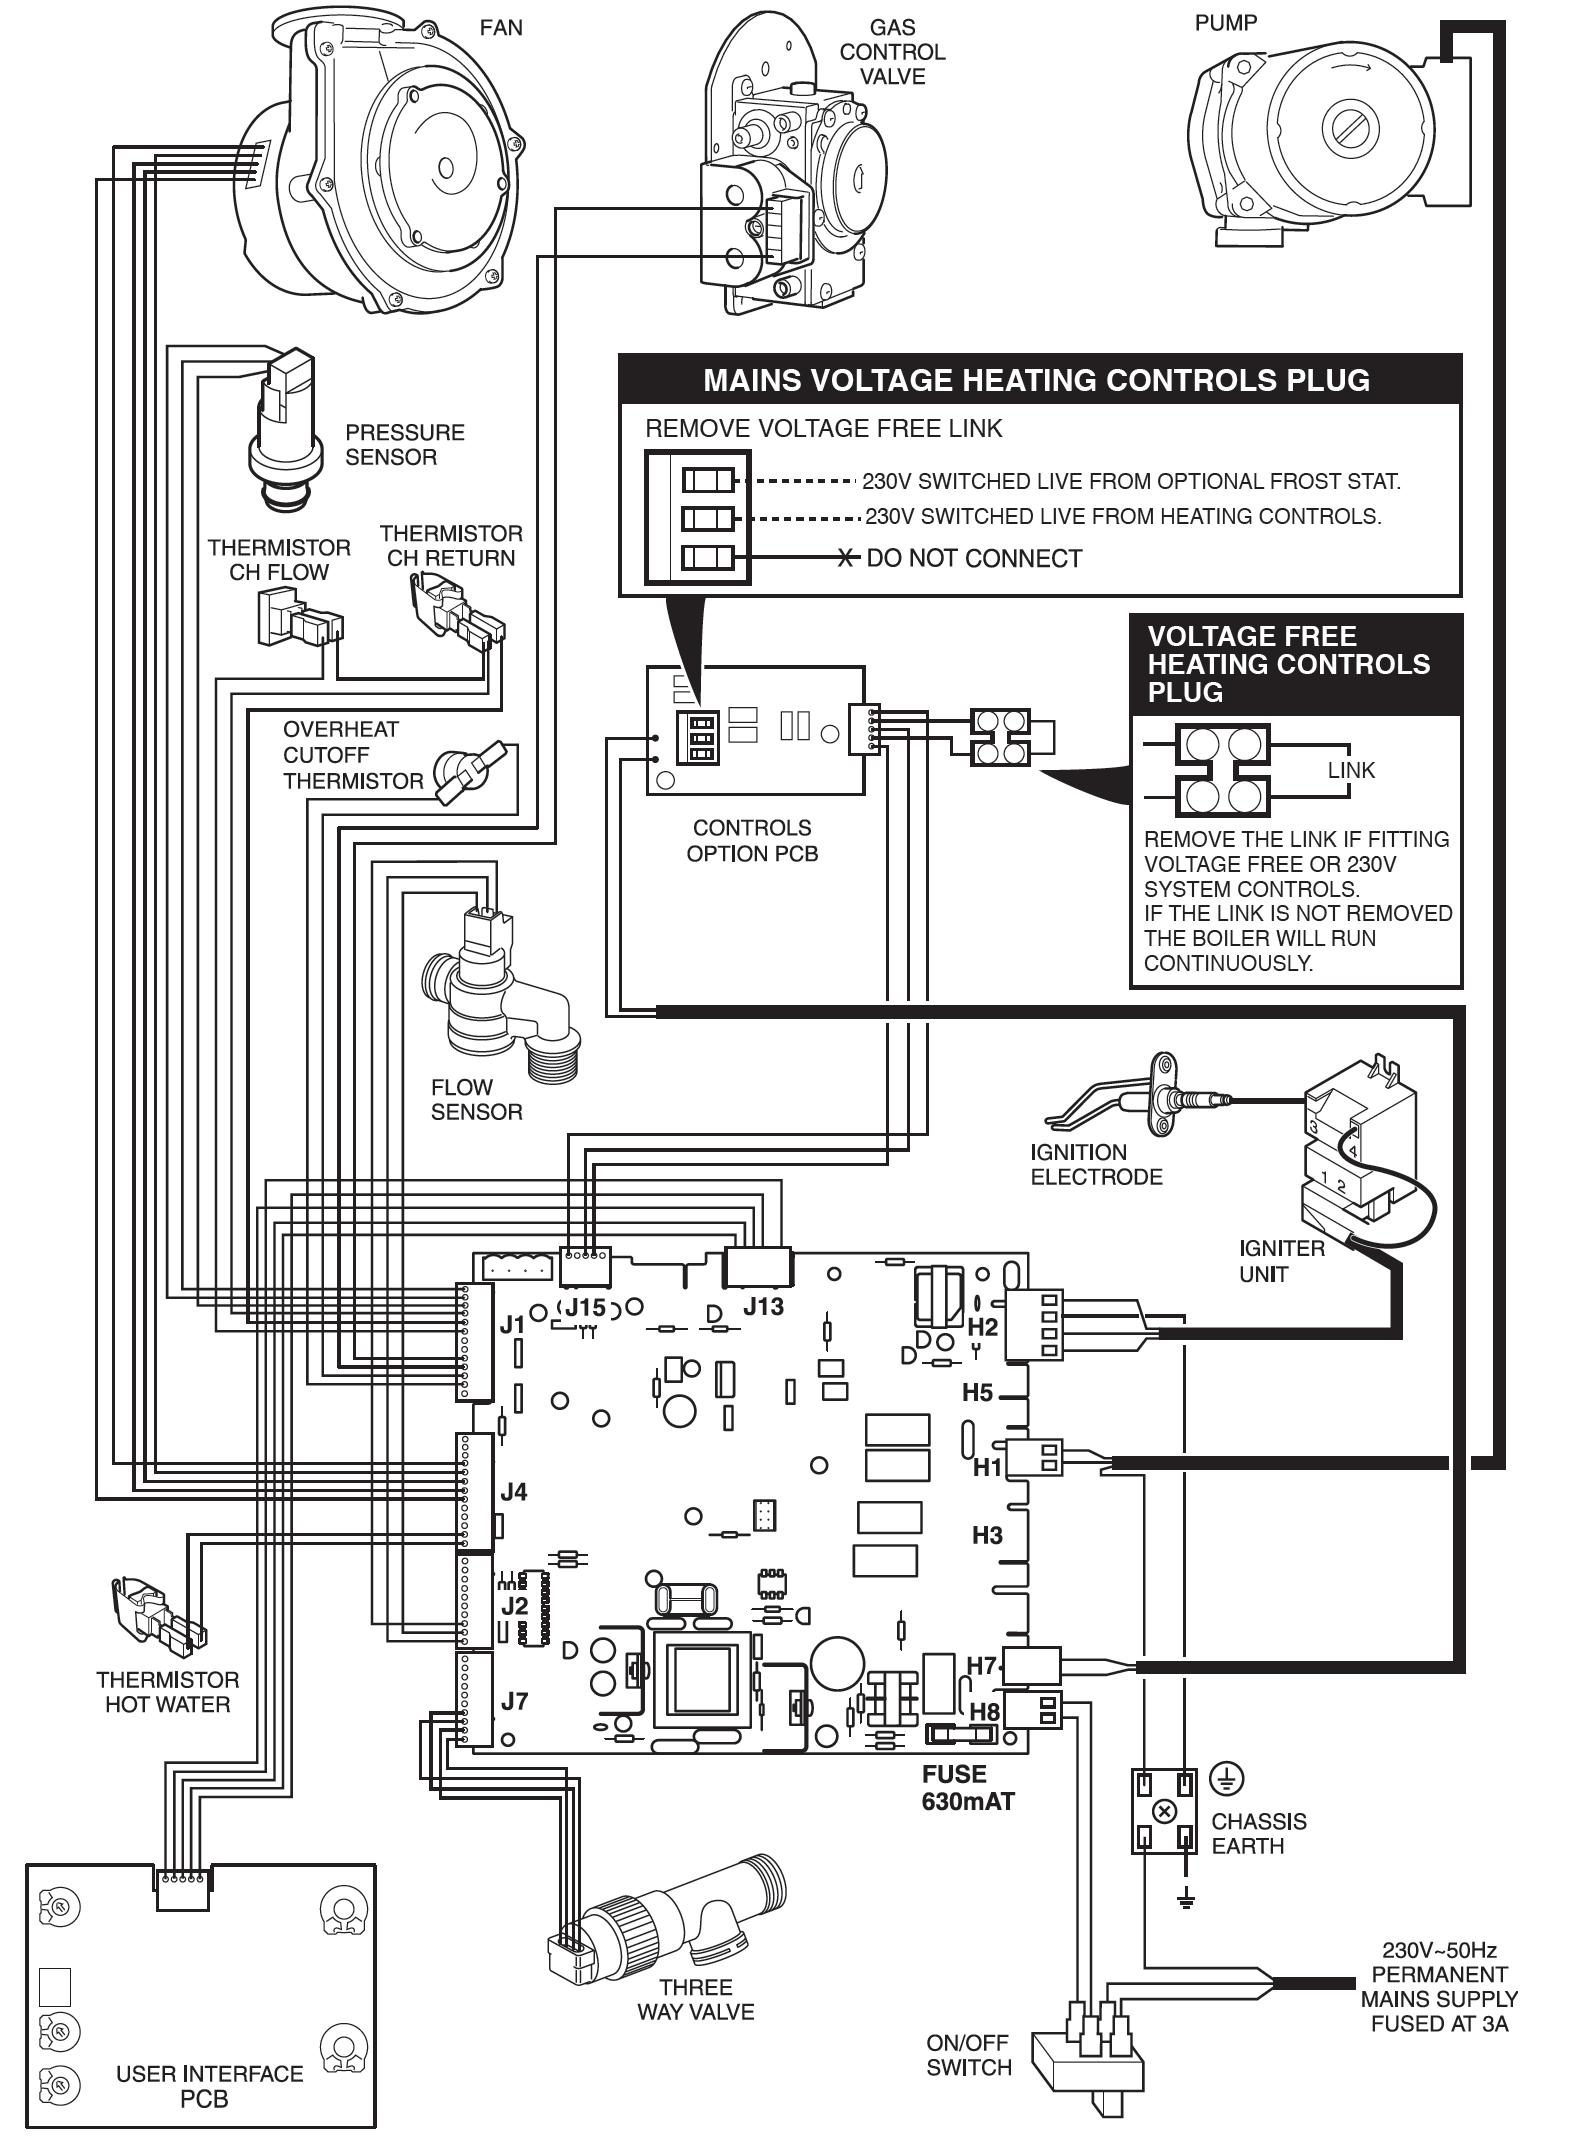 manrose fan wiring diagram gmc canyon stereo pedestal imageresizertool com